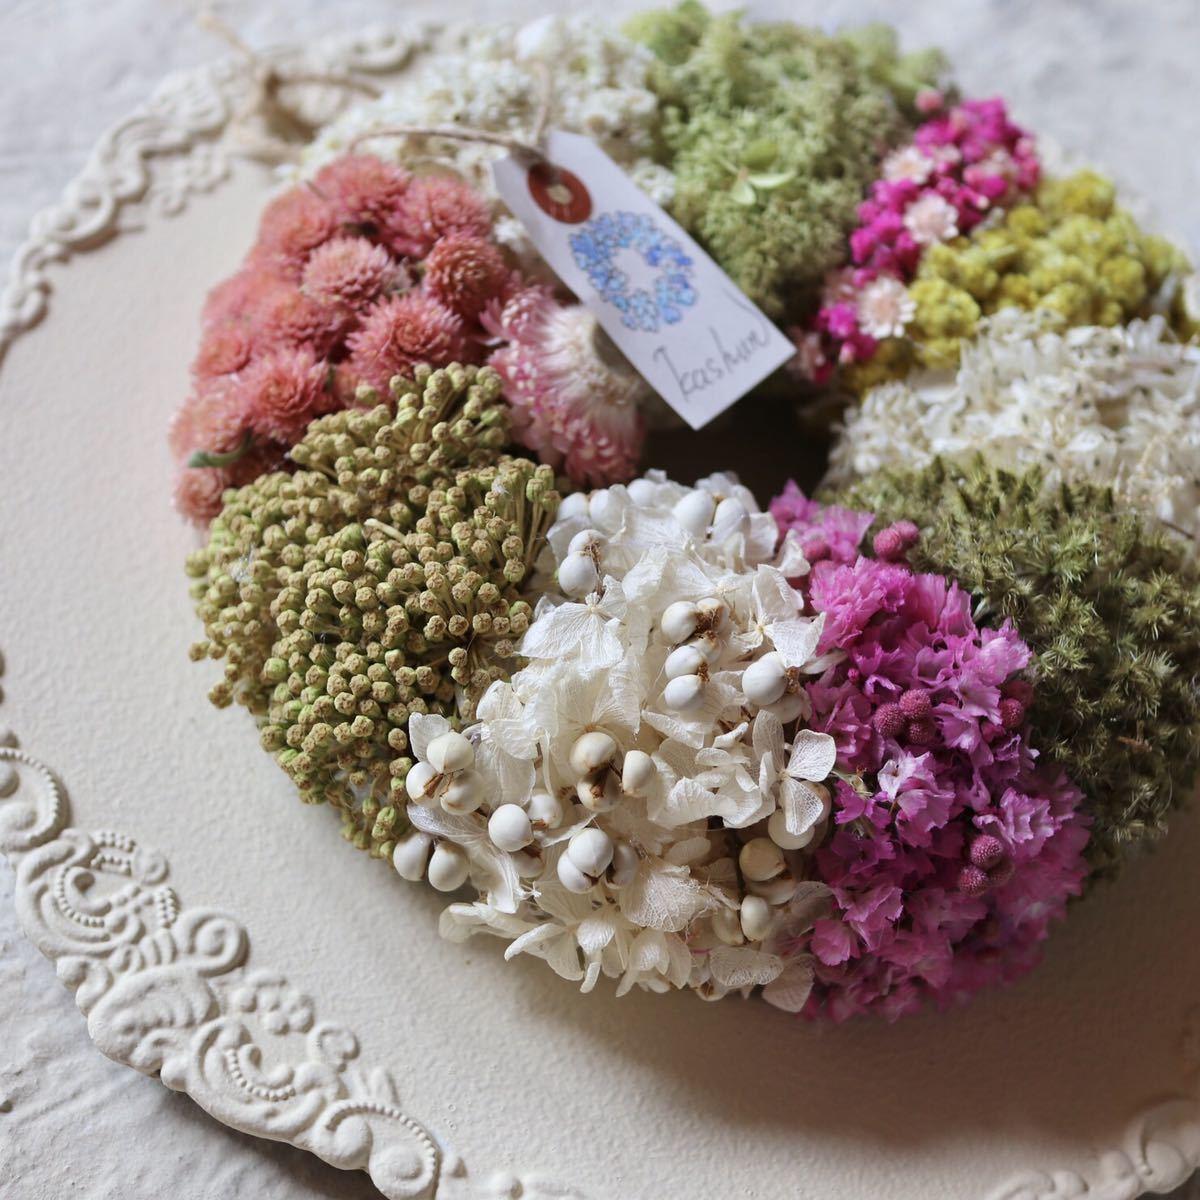 *kashun* (20cm)ハンドメイド コロンと丸いお菓子みたいなピンクのリース /ドライフラワー/壁飾り/誕生日プレゼント/お祝い/ギフト_画像8